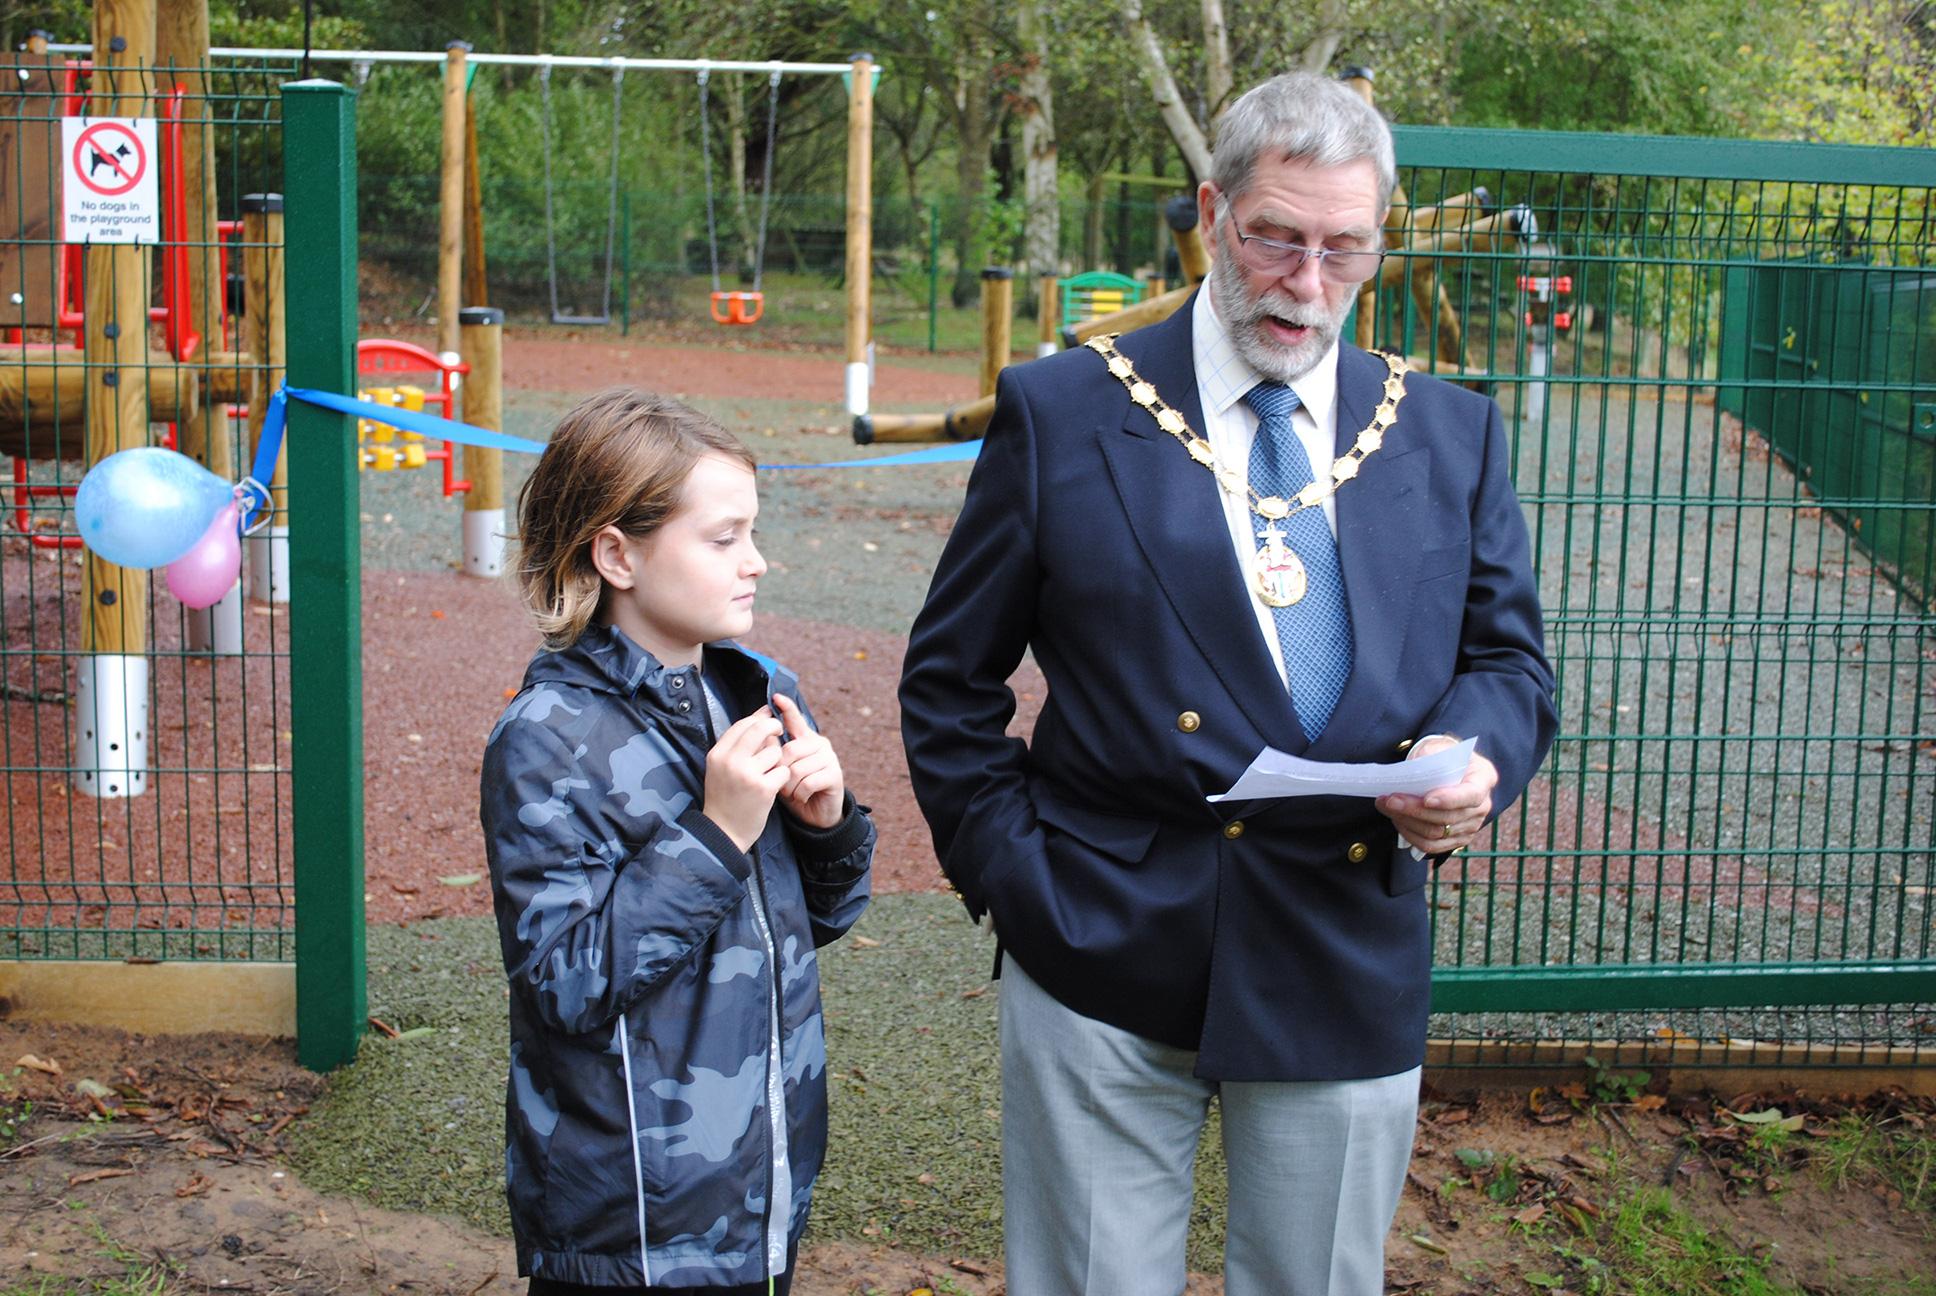 Deputy Mayor opens the playground